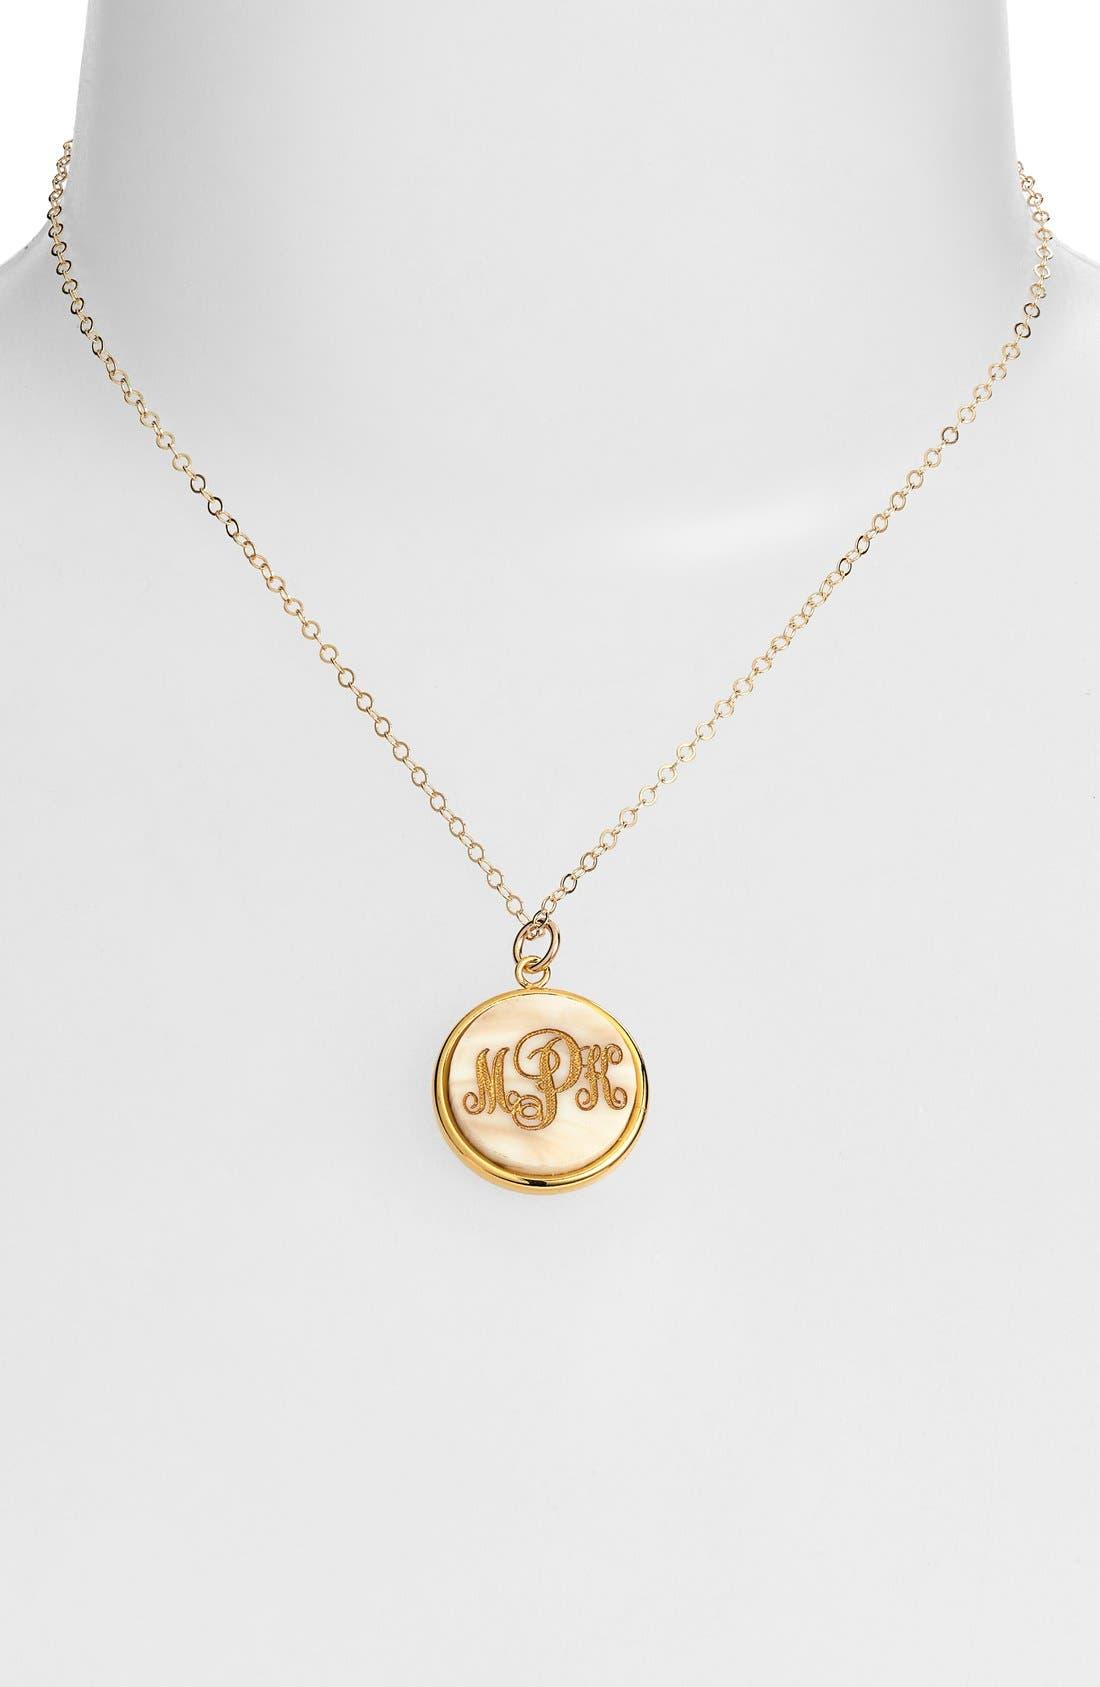 'Vineyard' Personalized Monogram Pendant Necklace,                             Alternate thumbnail 2, color,                             900